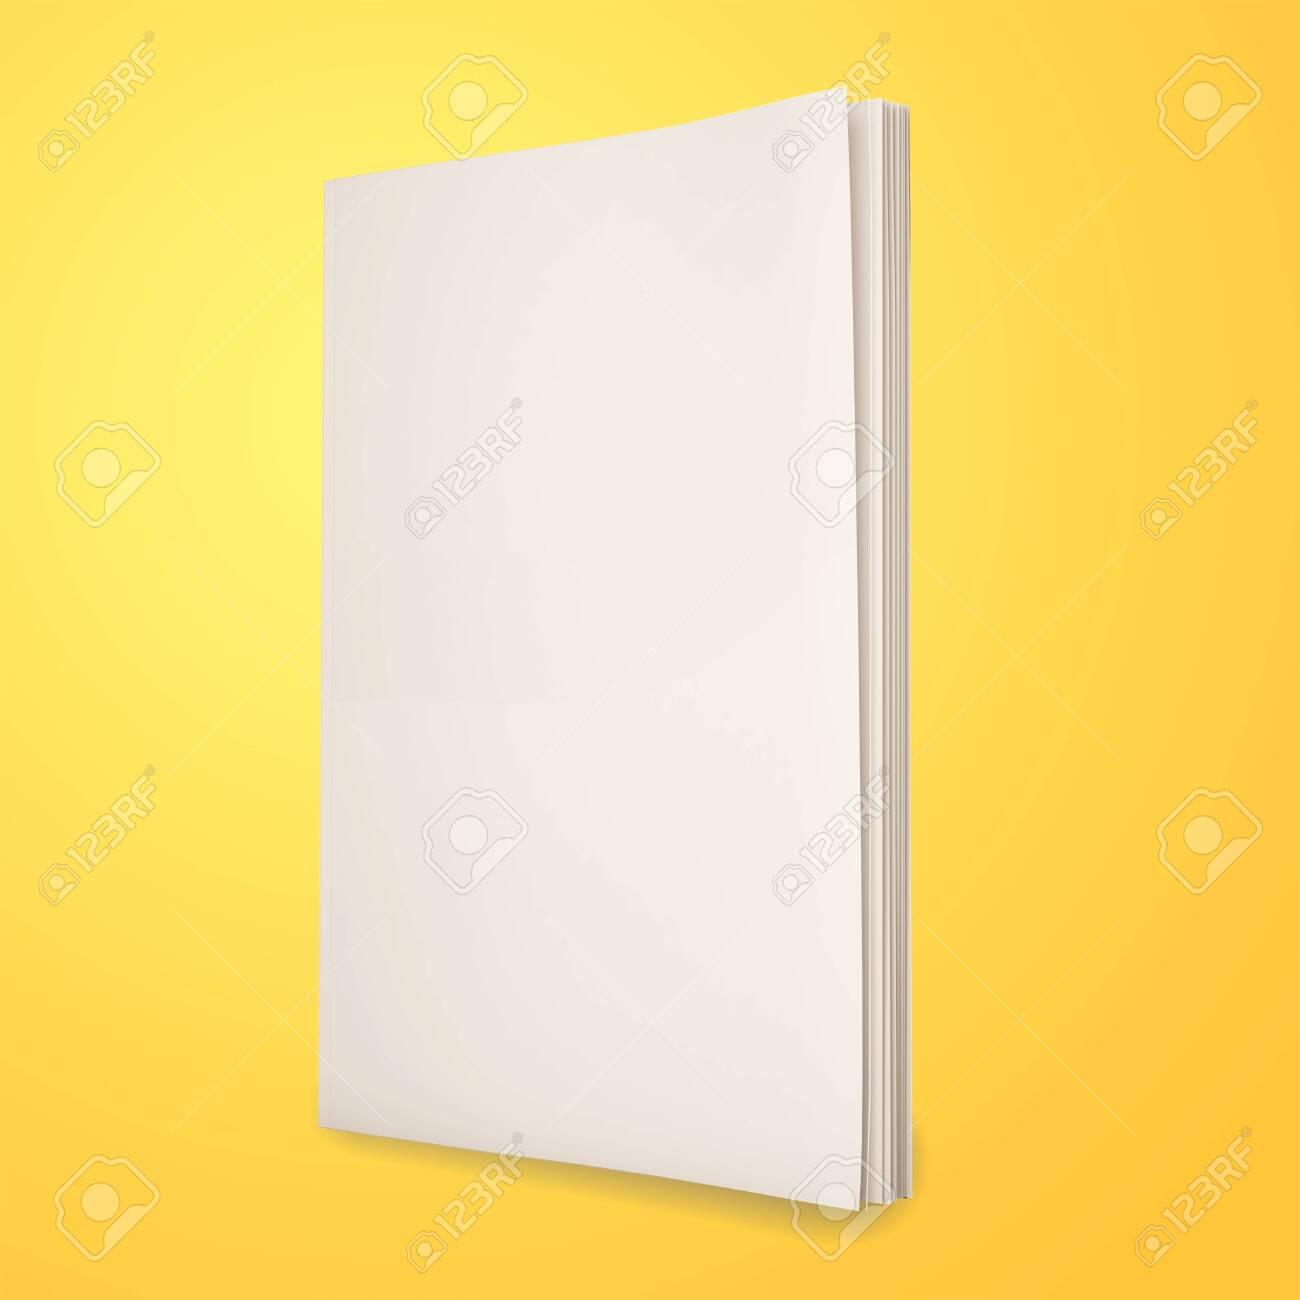 Blank magazines on yellow background - 134255127